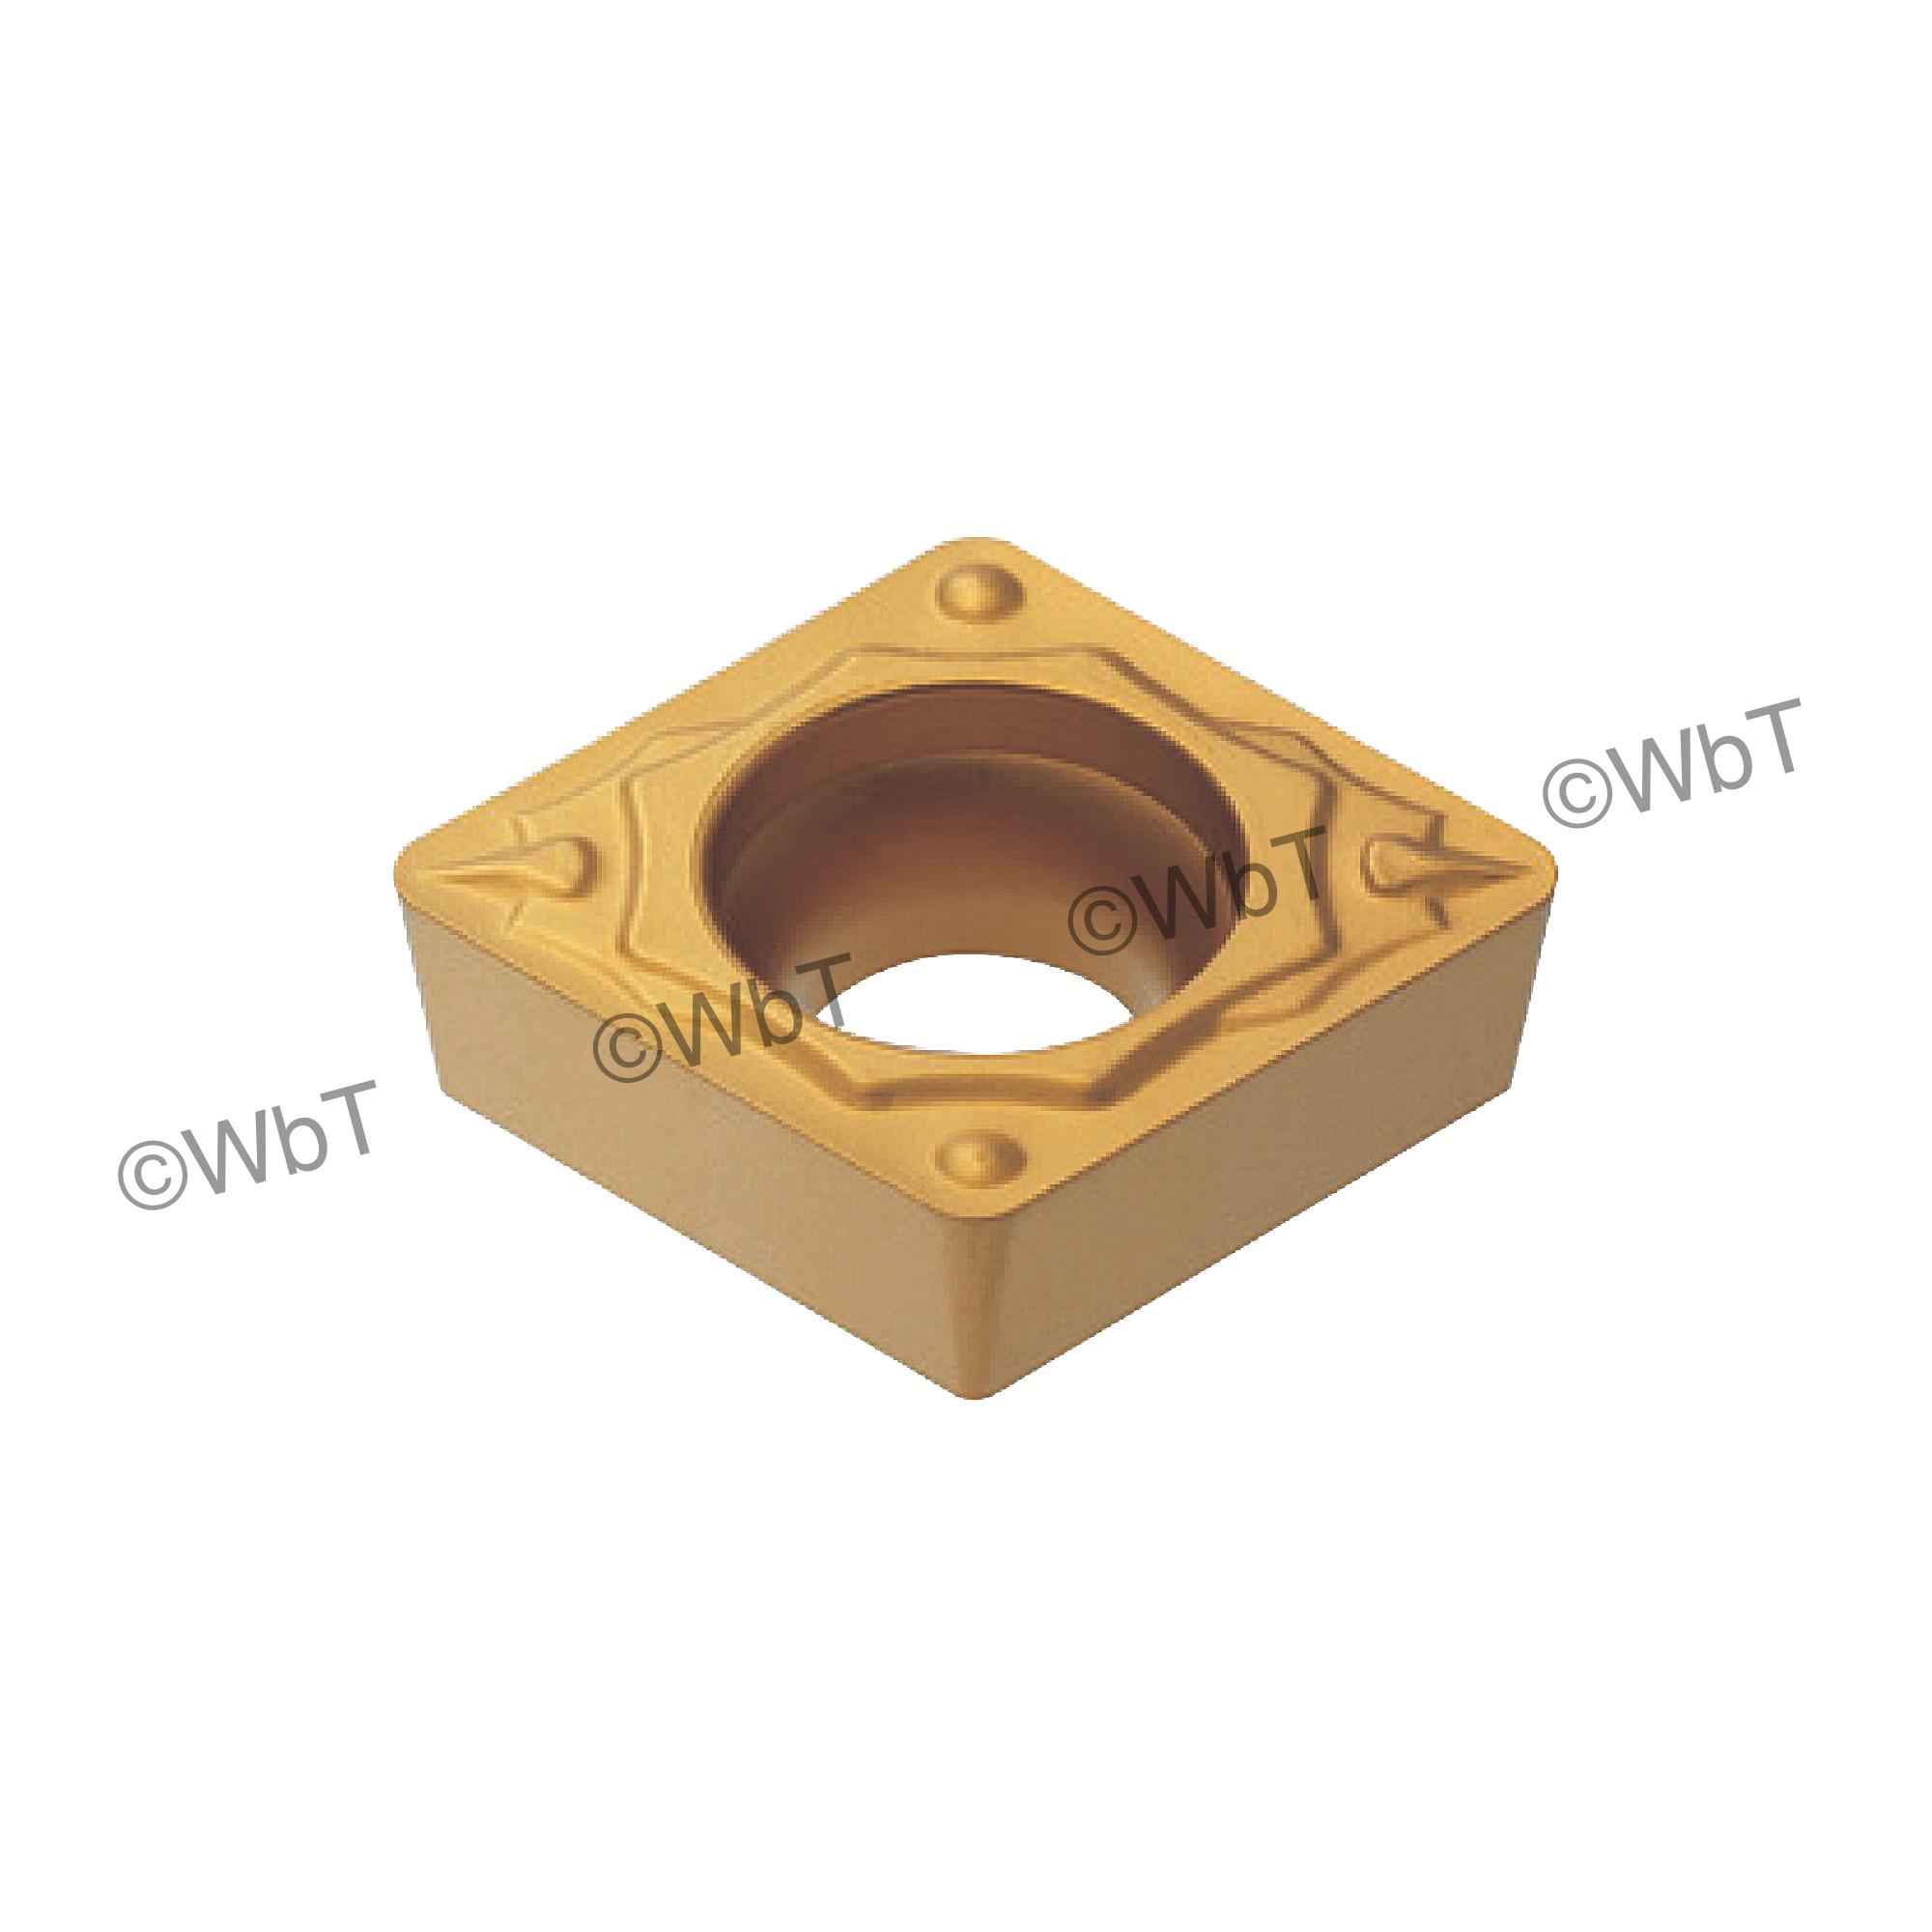 AKUMA - CCMT2(1.5)0.5-FP1 CT25M - 80° Diamond / Indexable Carbide Turning Insert